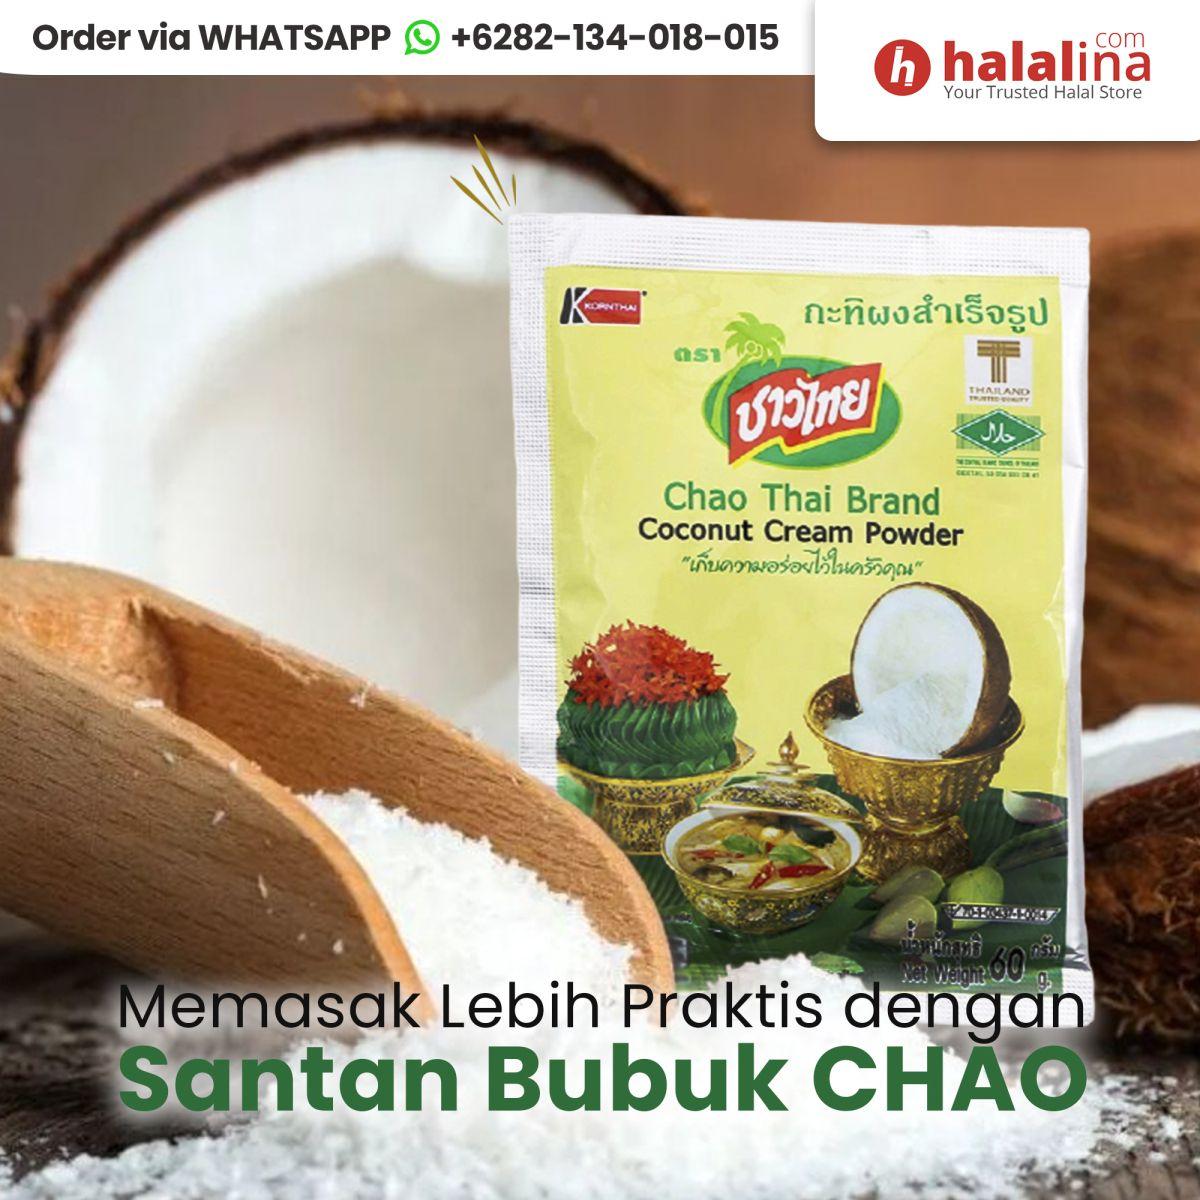 Halalina Phone 62 821 3401 8015 Halal Shop Japan In 2020 Halal Recipes Halal Snacks Halal